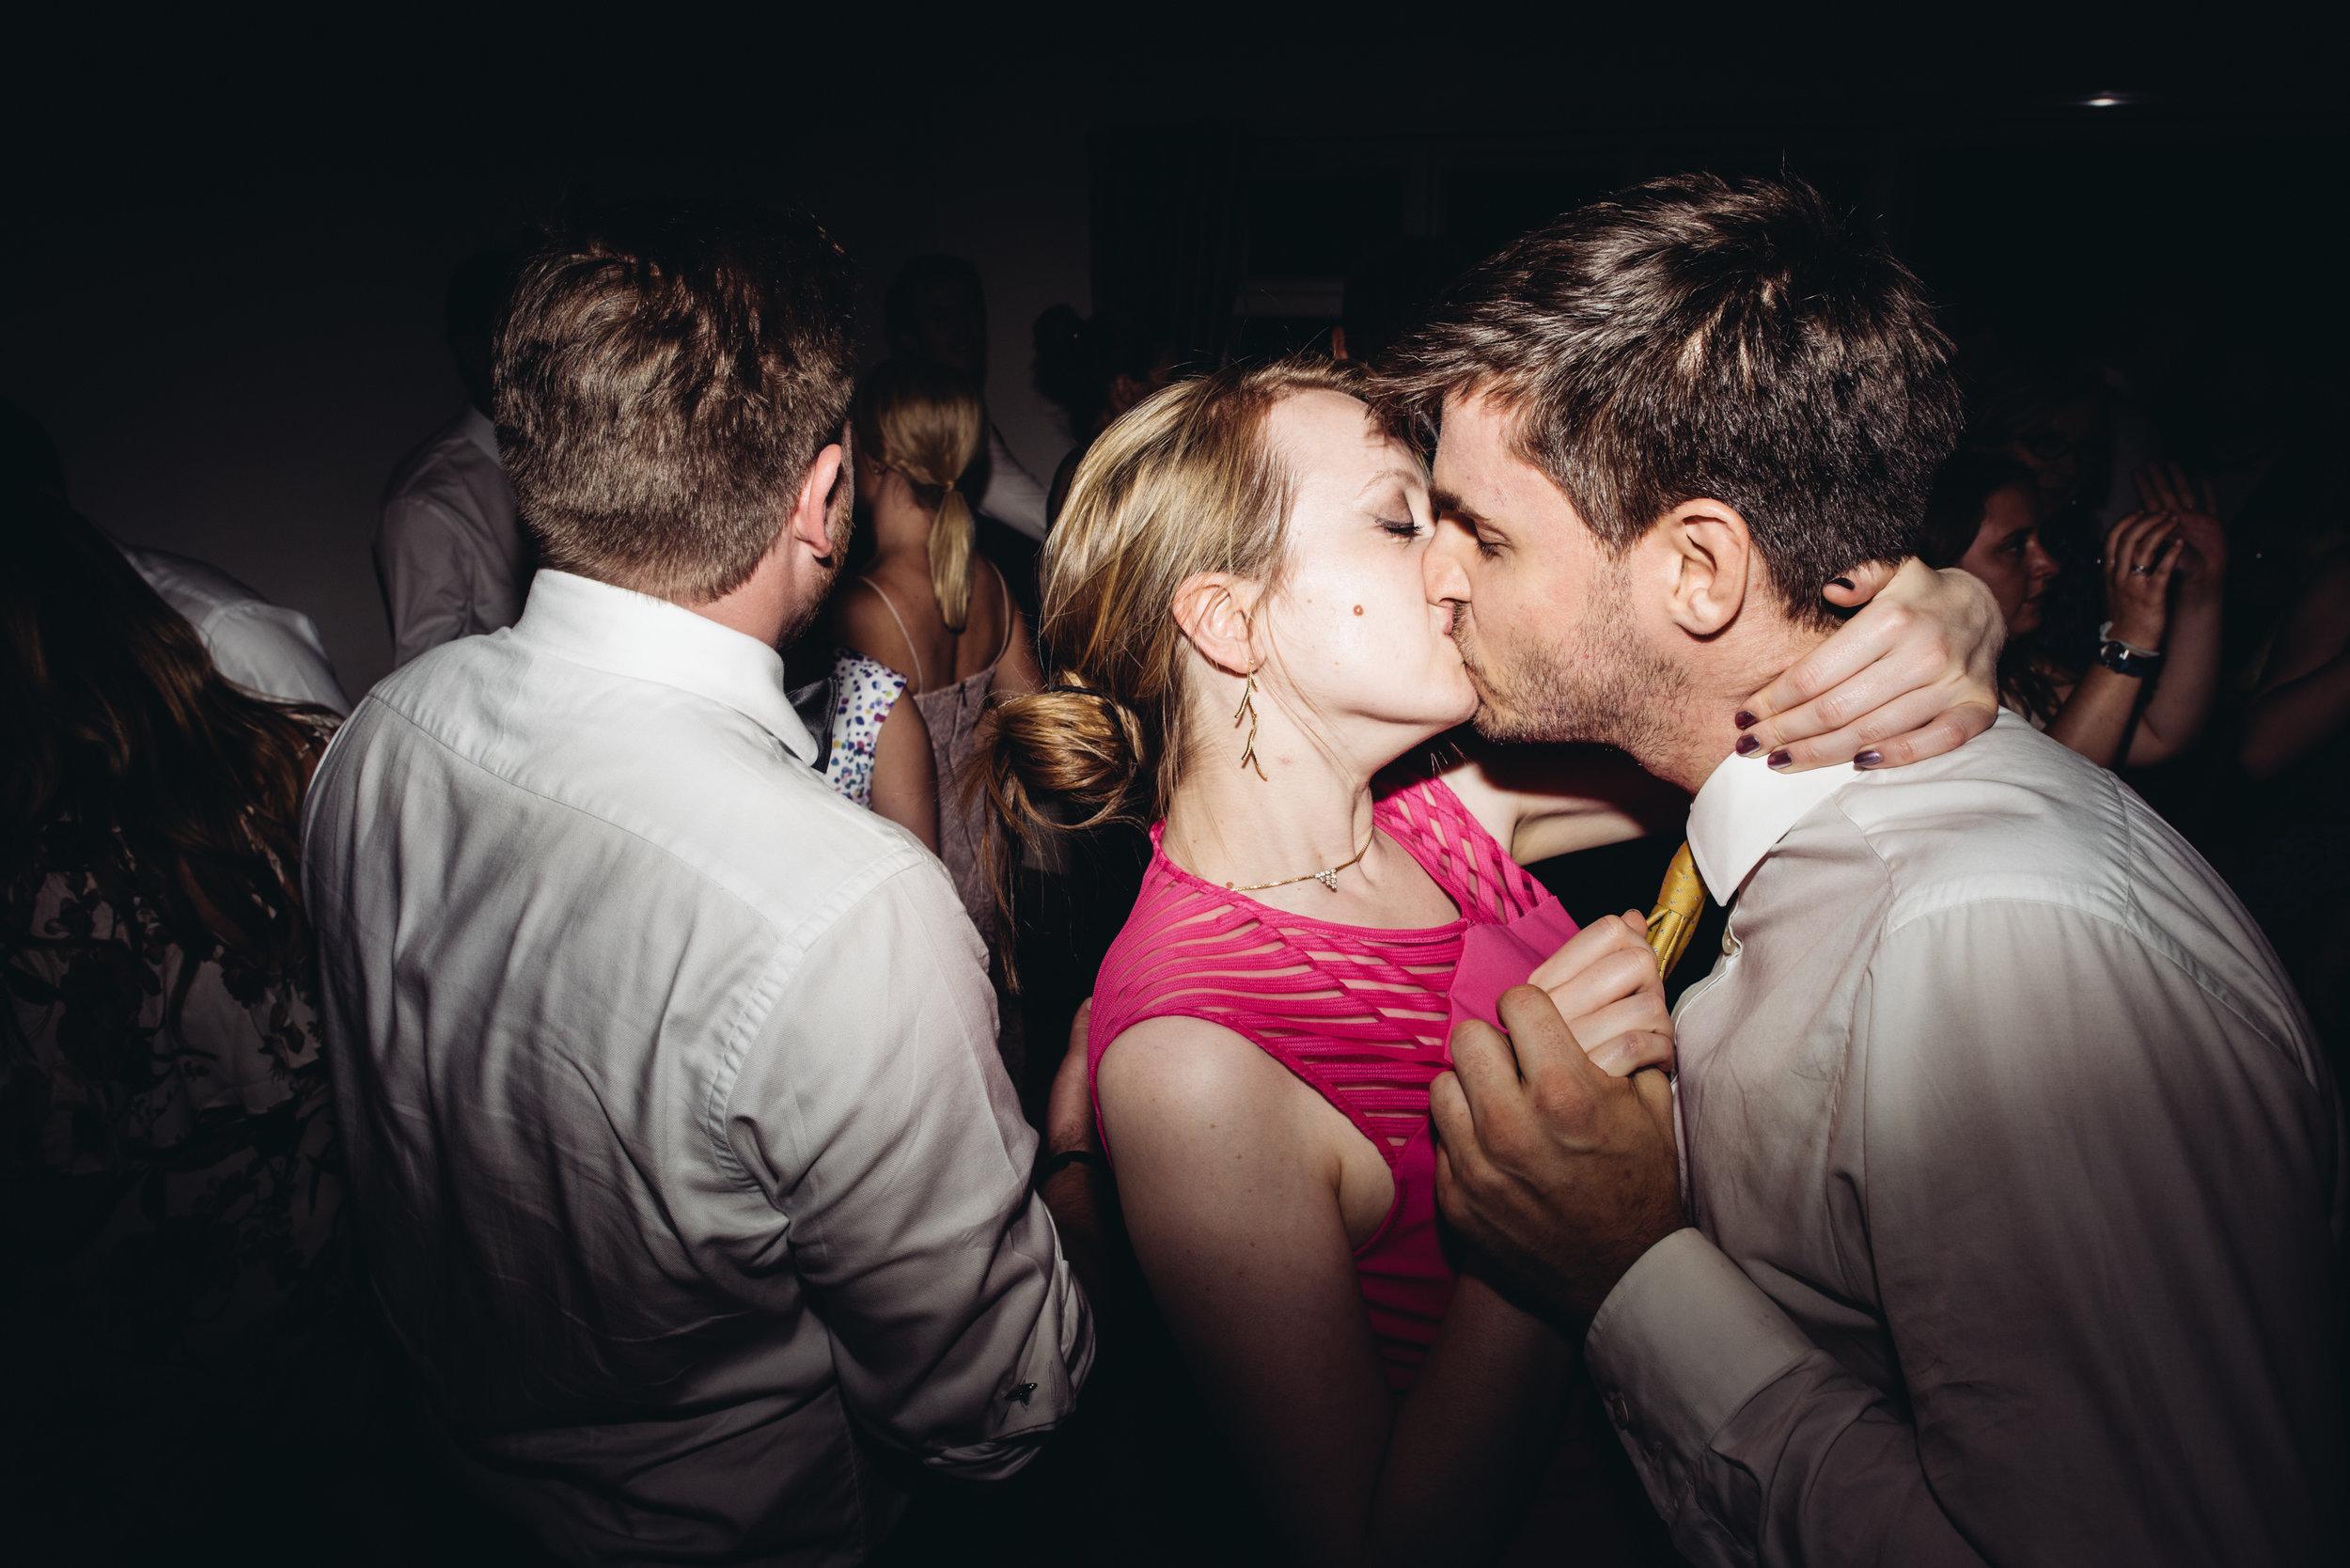 0244-LISA-DEVINE-PHOTOGRAPHY-ALTERNATIVE-WEDDING-PHOTOGRAPHY-SCOTLAND-DESTINATION-WEDDINGS-GLASGOW-WEDDINGS-COOL-WEDDINGS-STYLISH-WEDDINGS.JPG